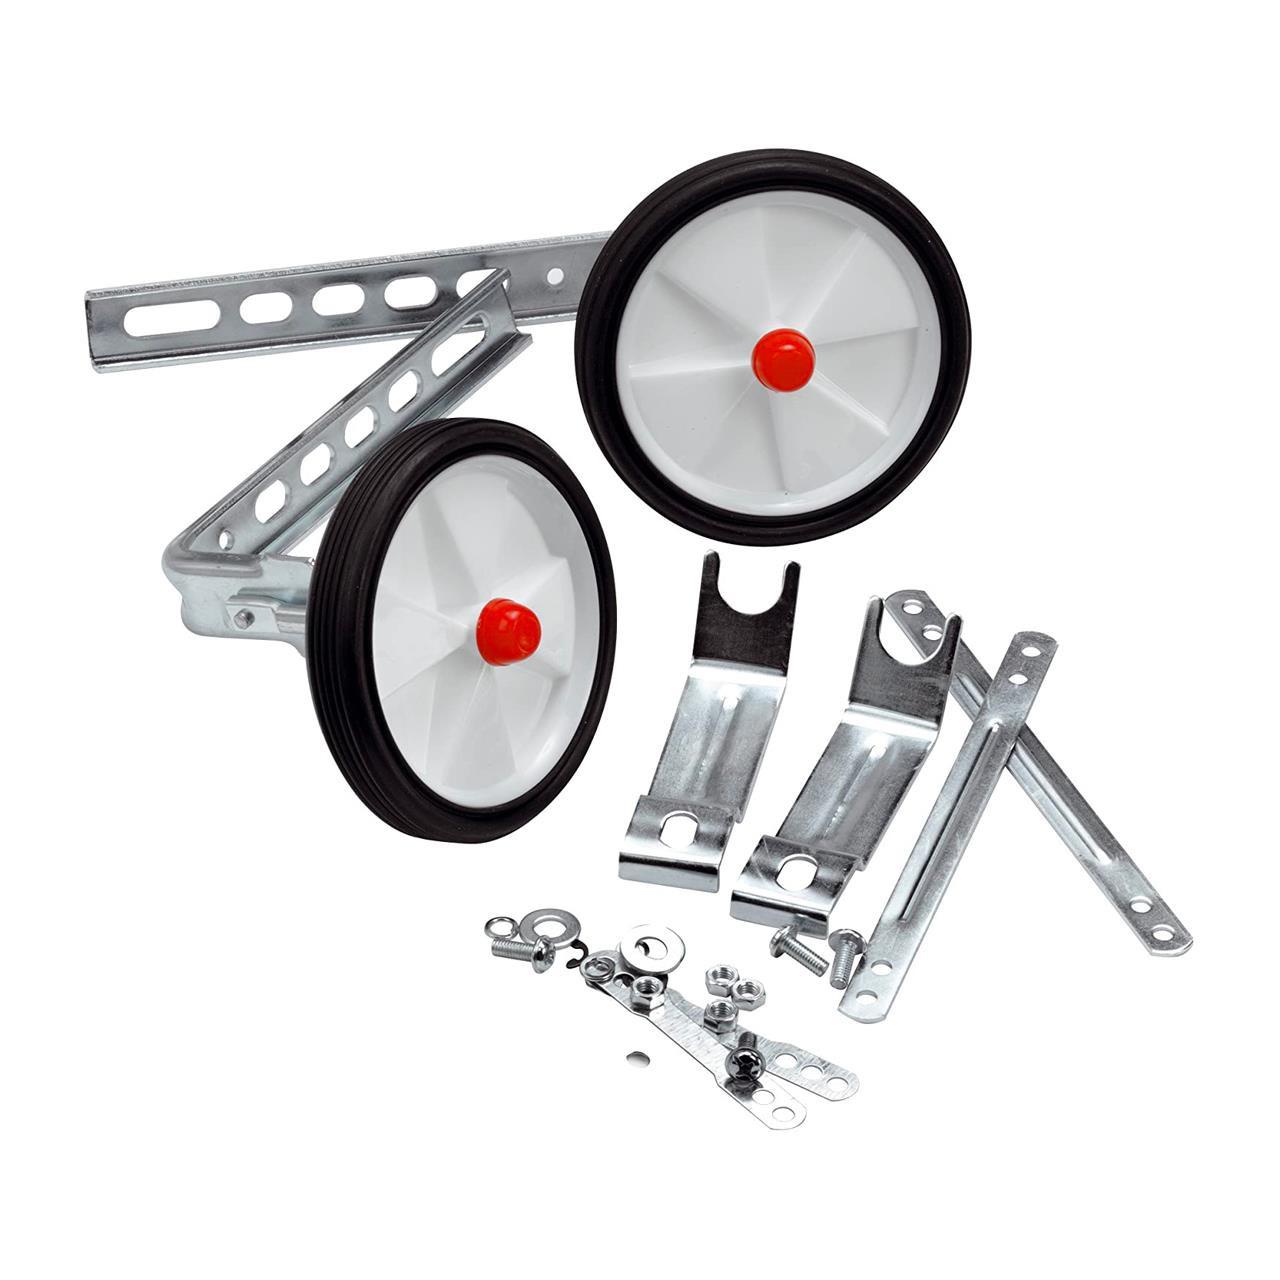 Raleigh Universal Junior Wheel Stabiliser (Silver)